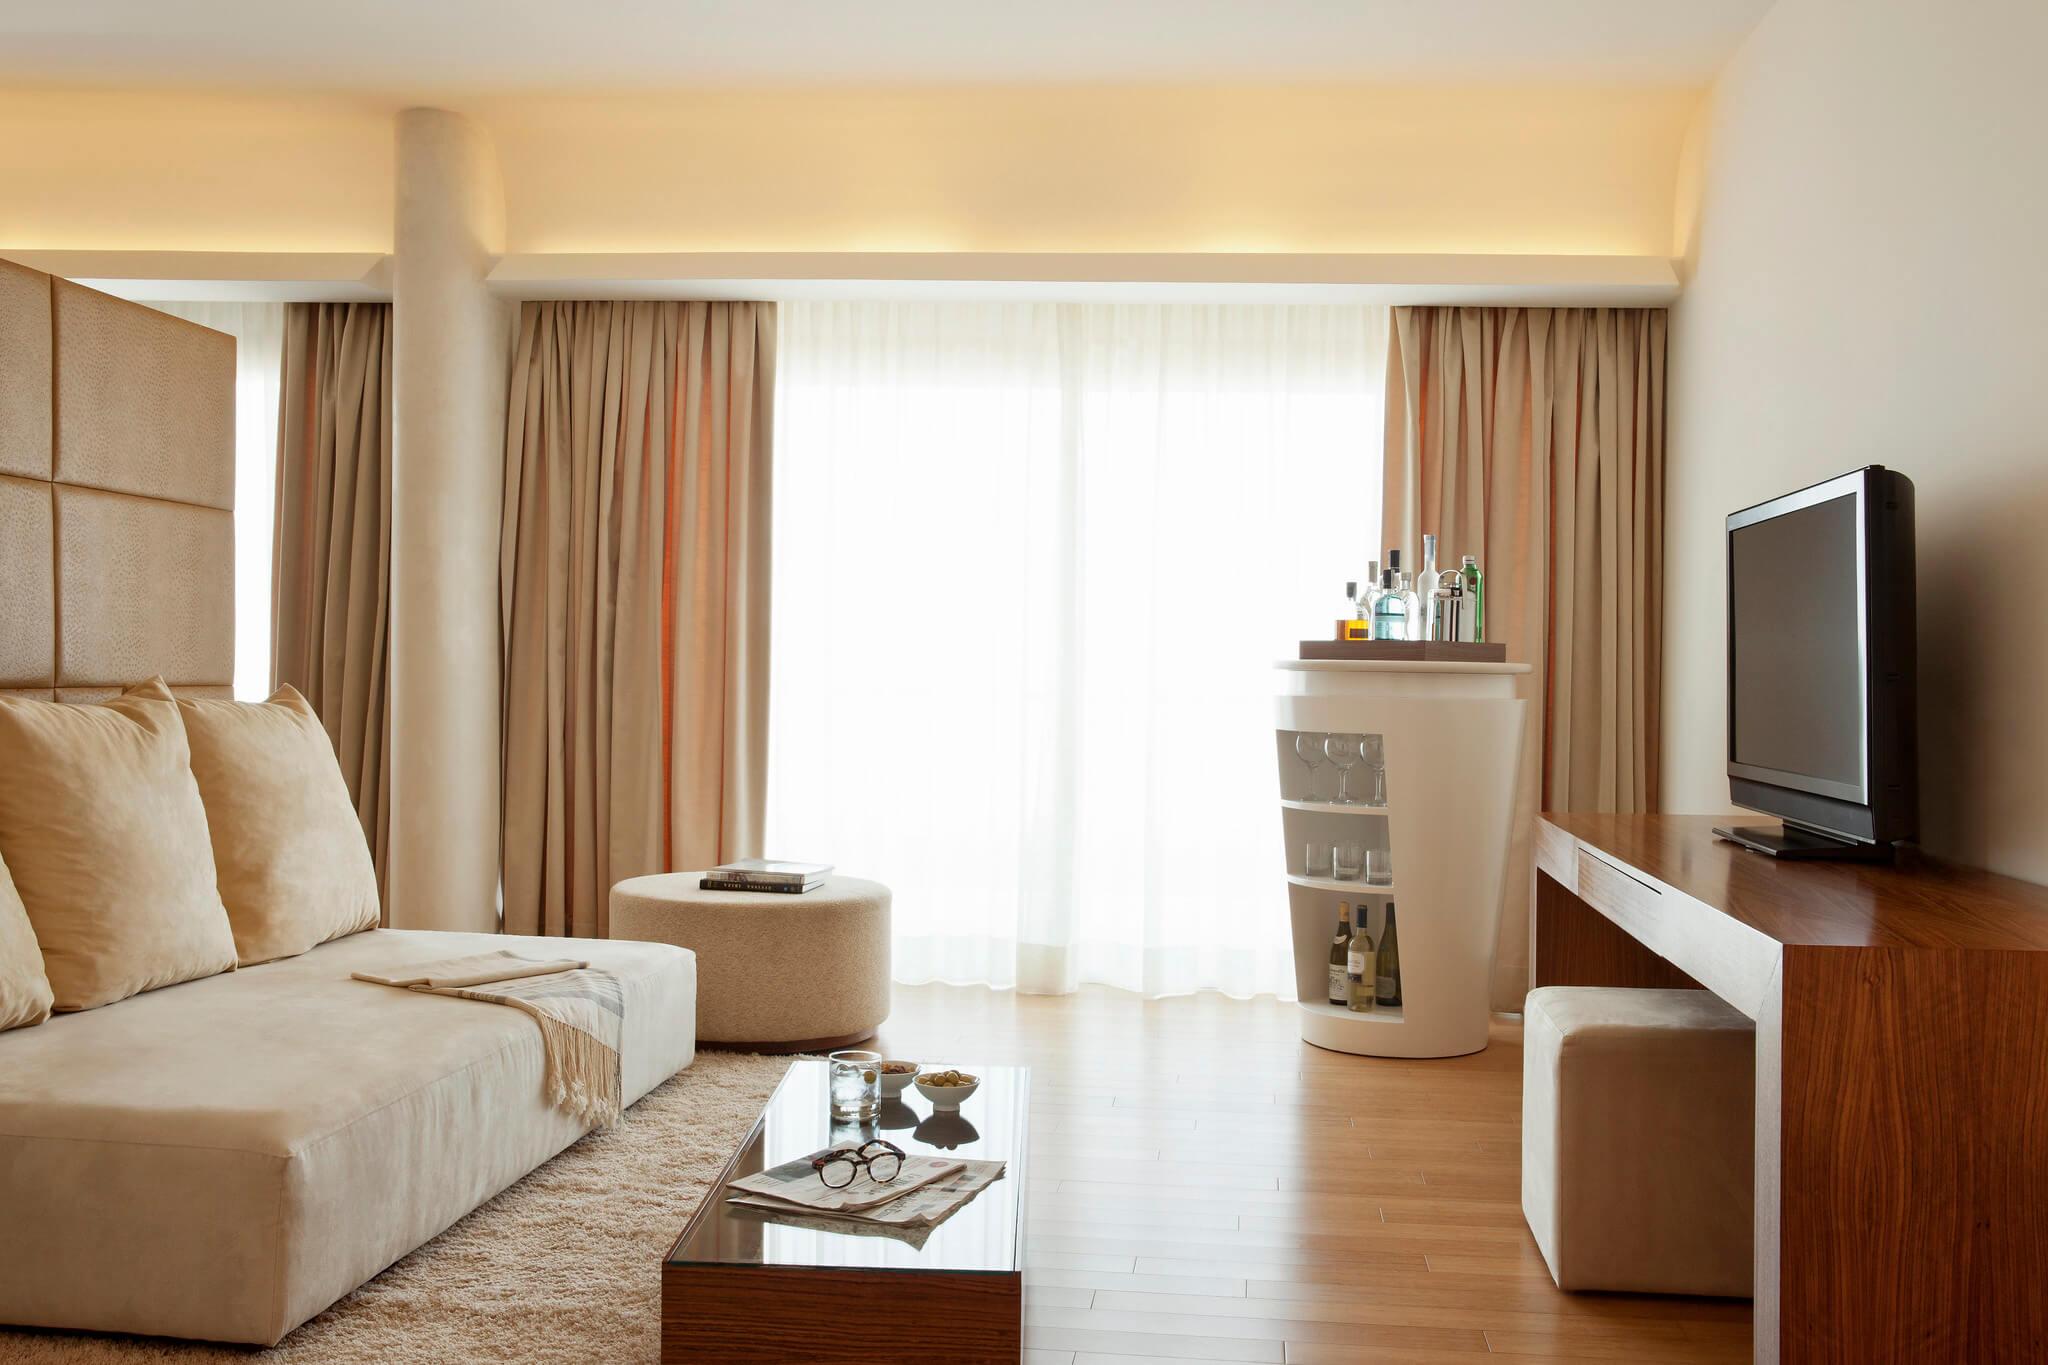 https://www.white-ibiza.com/wp-content/uploads/2020/02/white-ibiza-hotels-ibiza-gran-hotel-2020-08.jpg